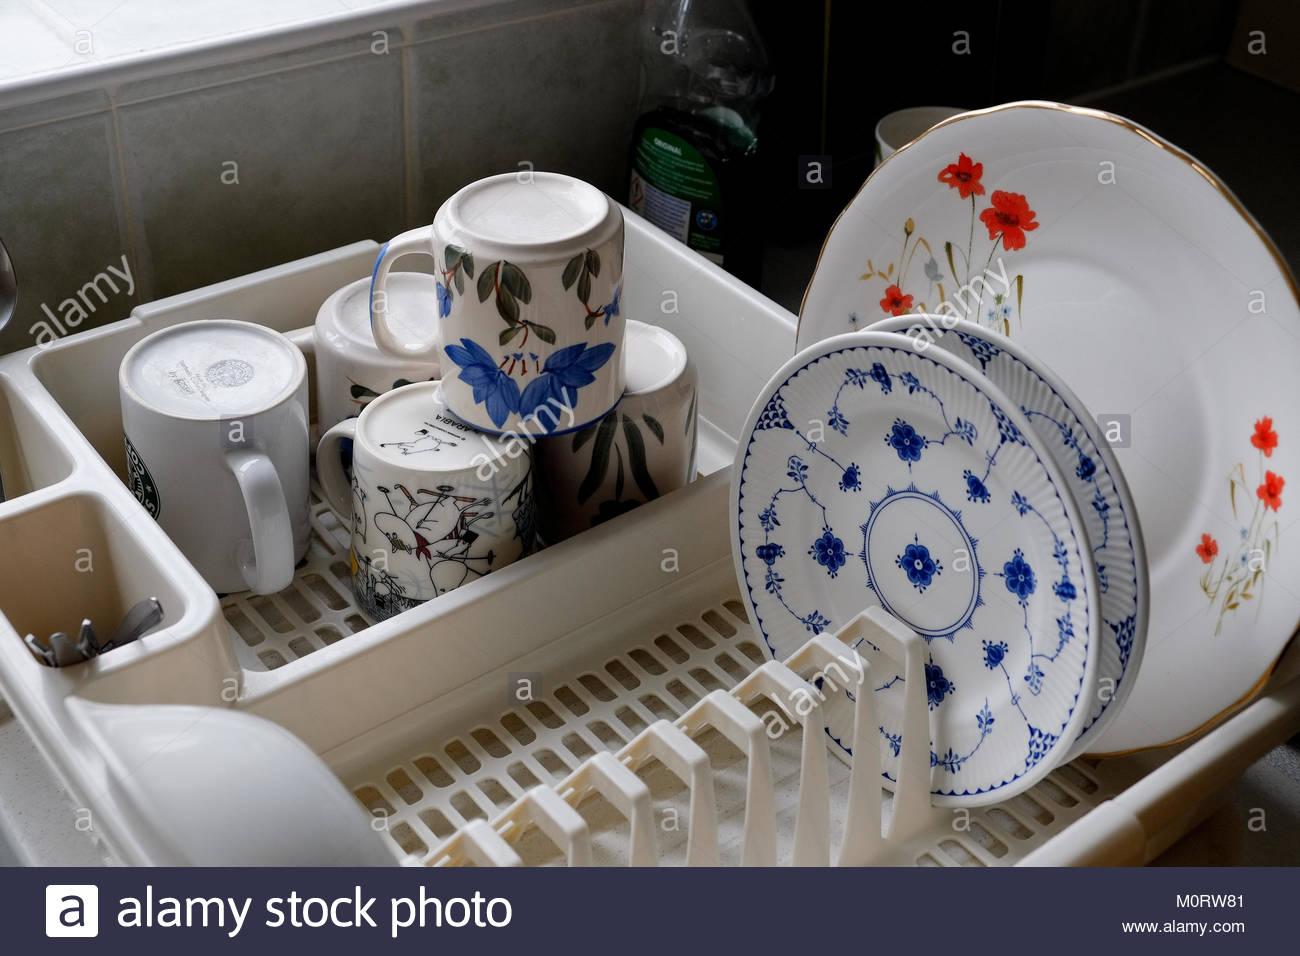 Plates Chores Washing Stockfotos & Plates Chores Washing Bilder - Alamy